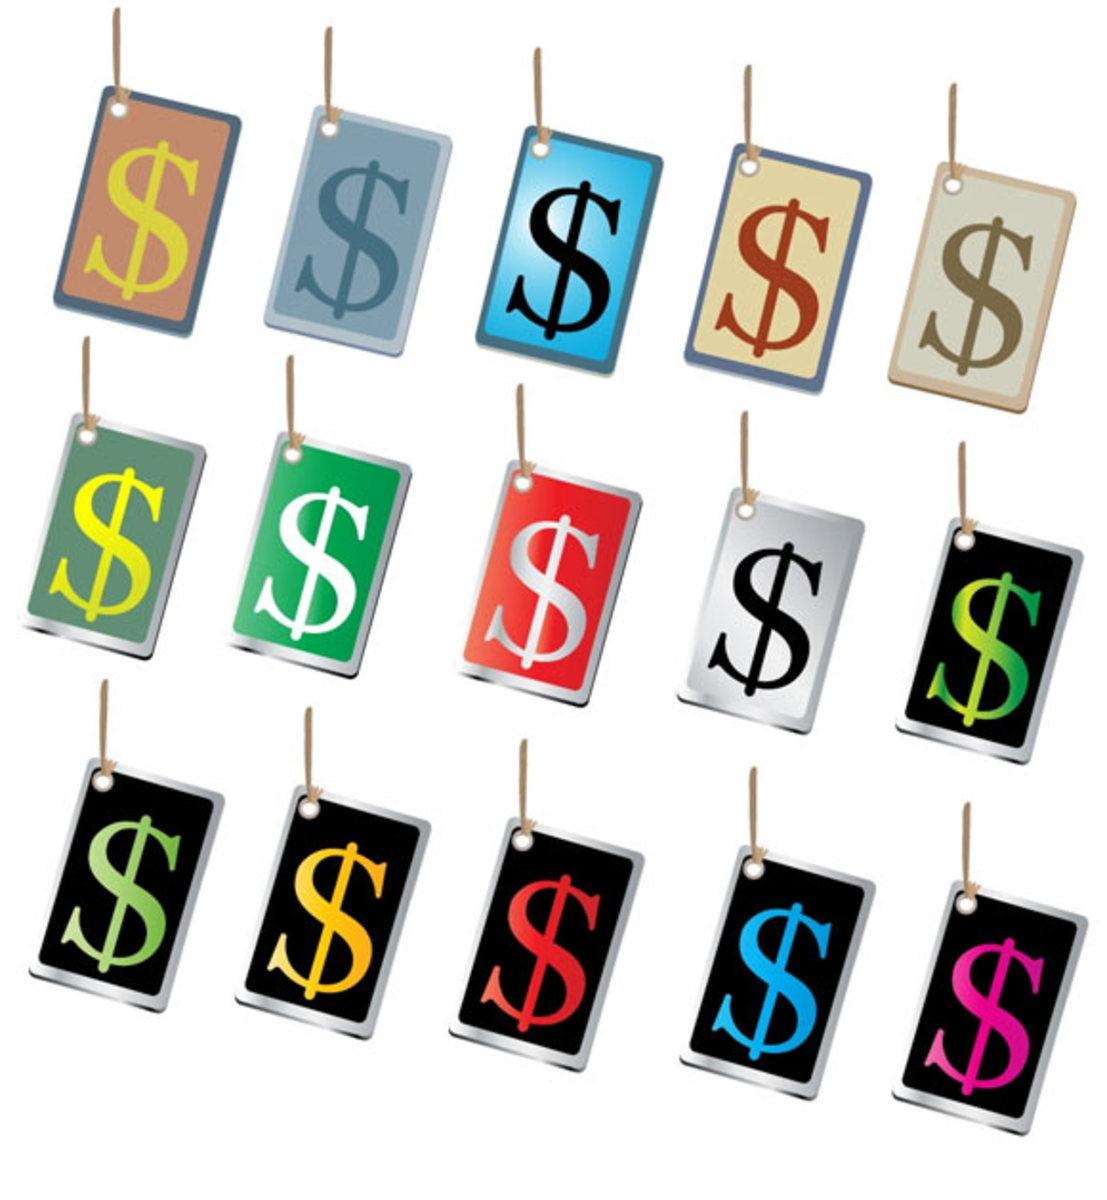 Budget Planning - Save Money